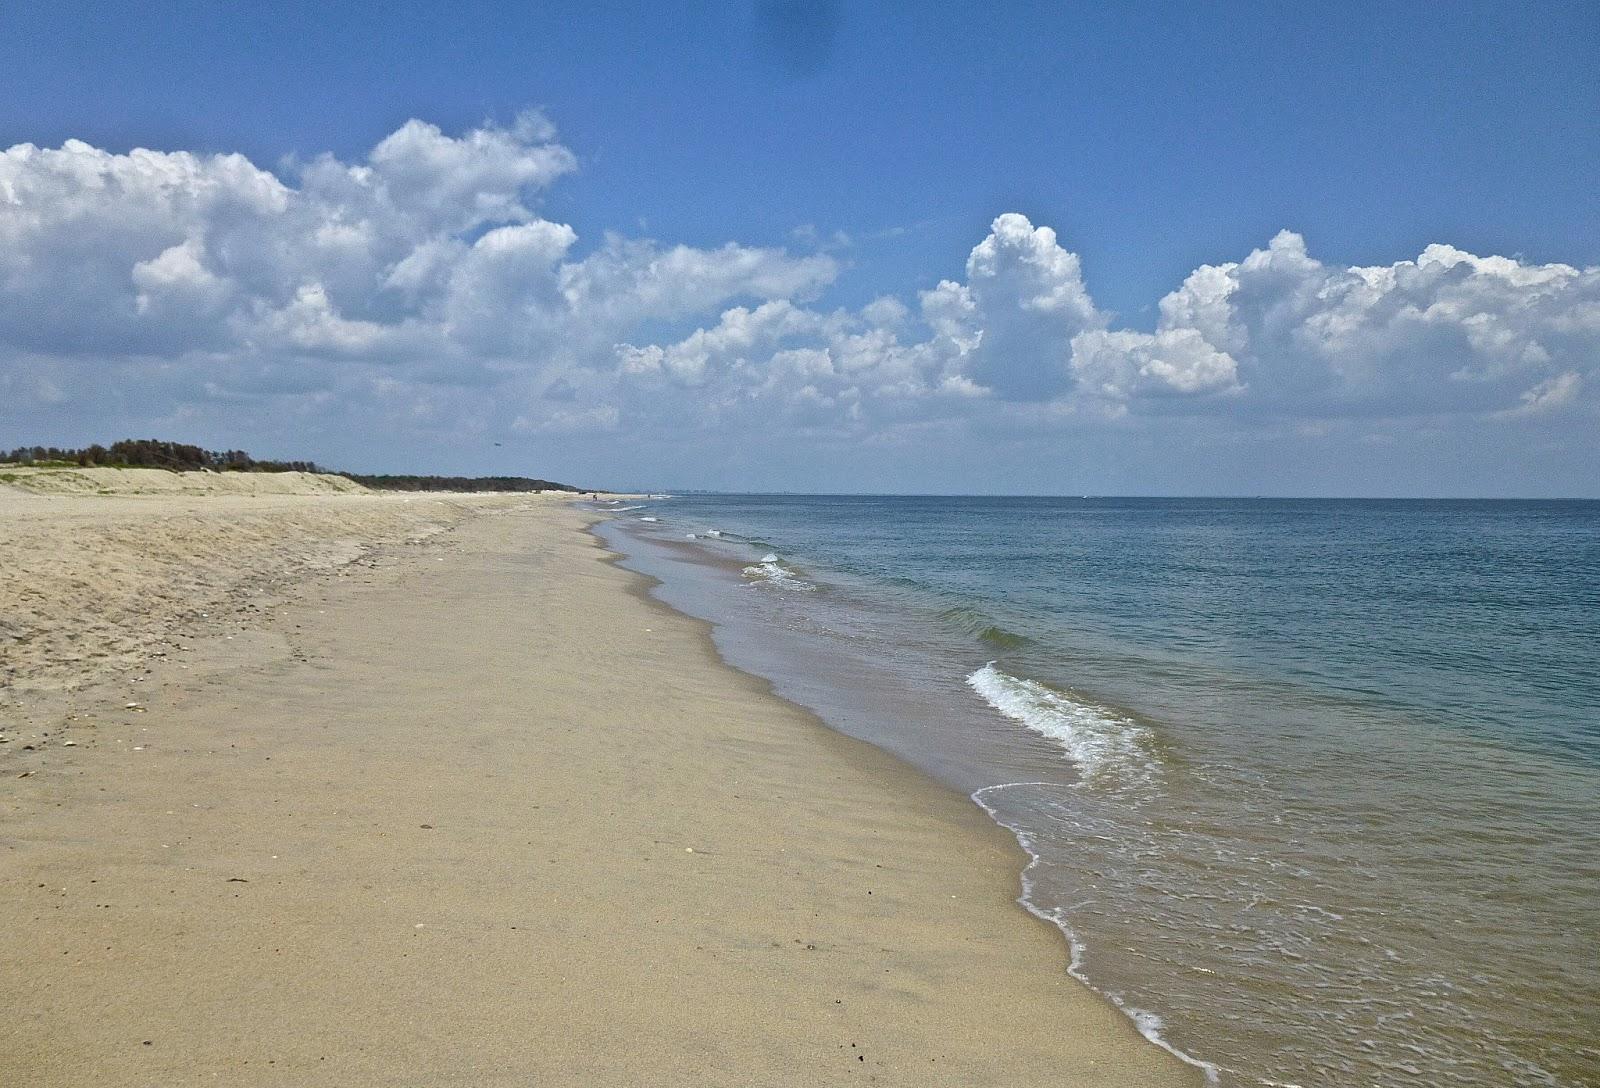 iPhone Instagram Photo Gunnison Beach Sandy Hook, NJ - a